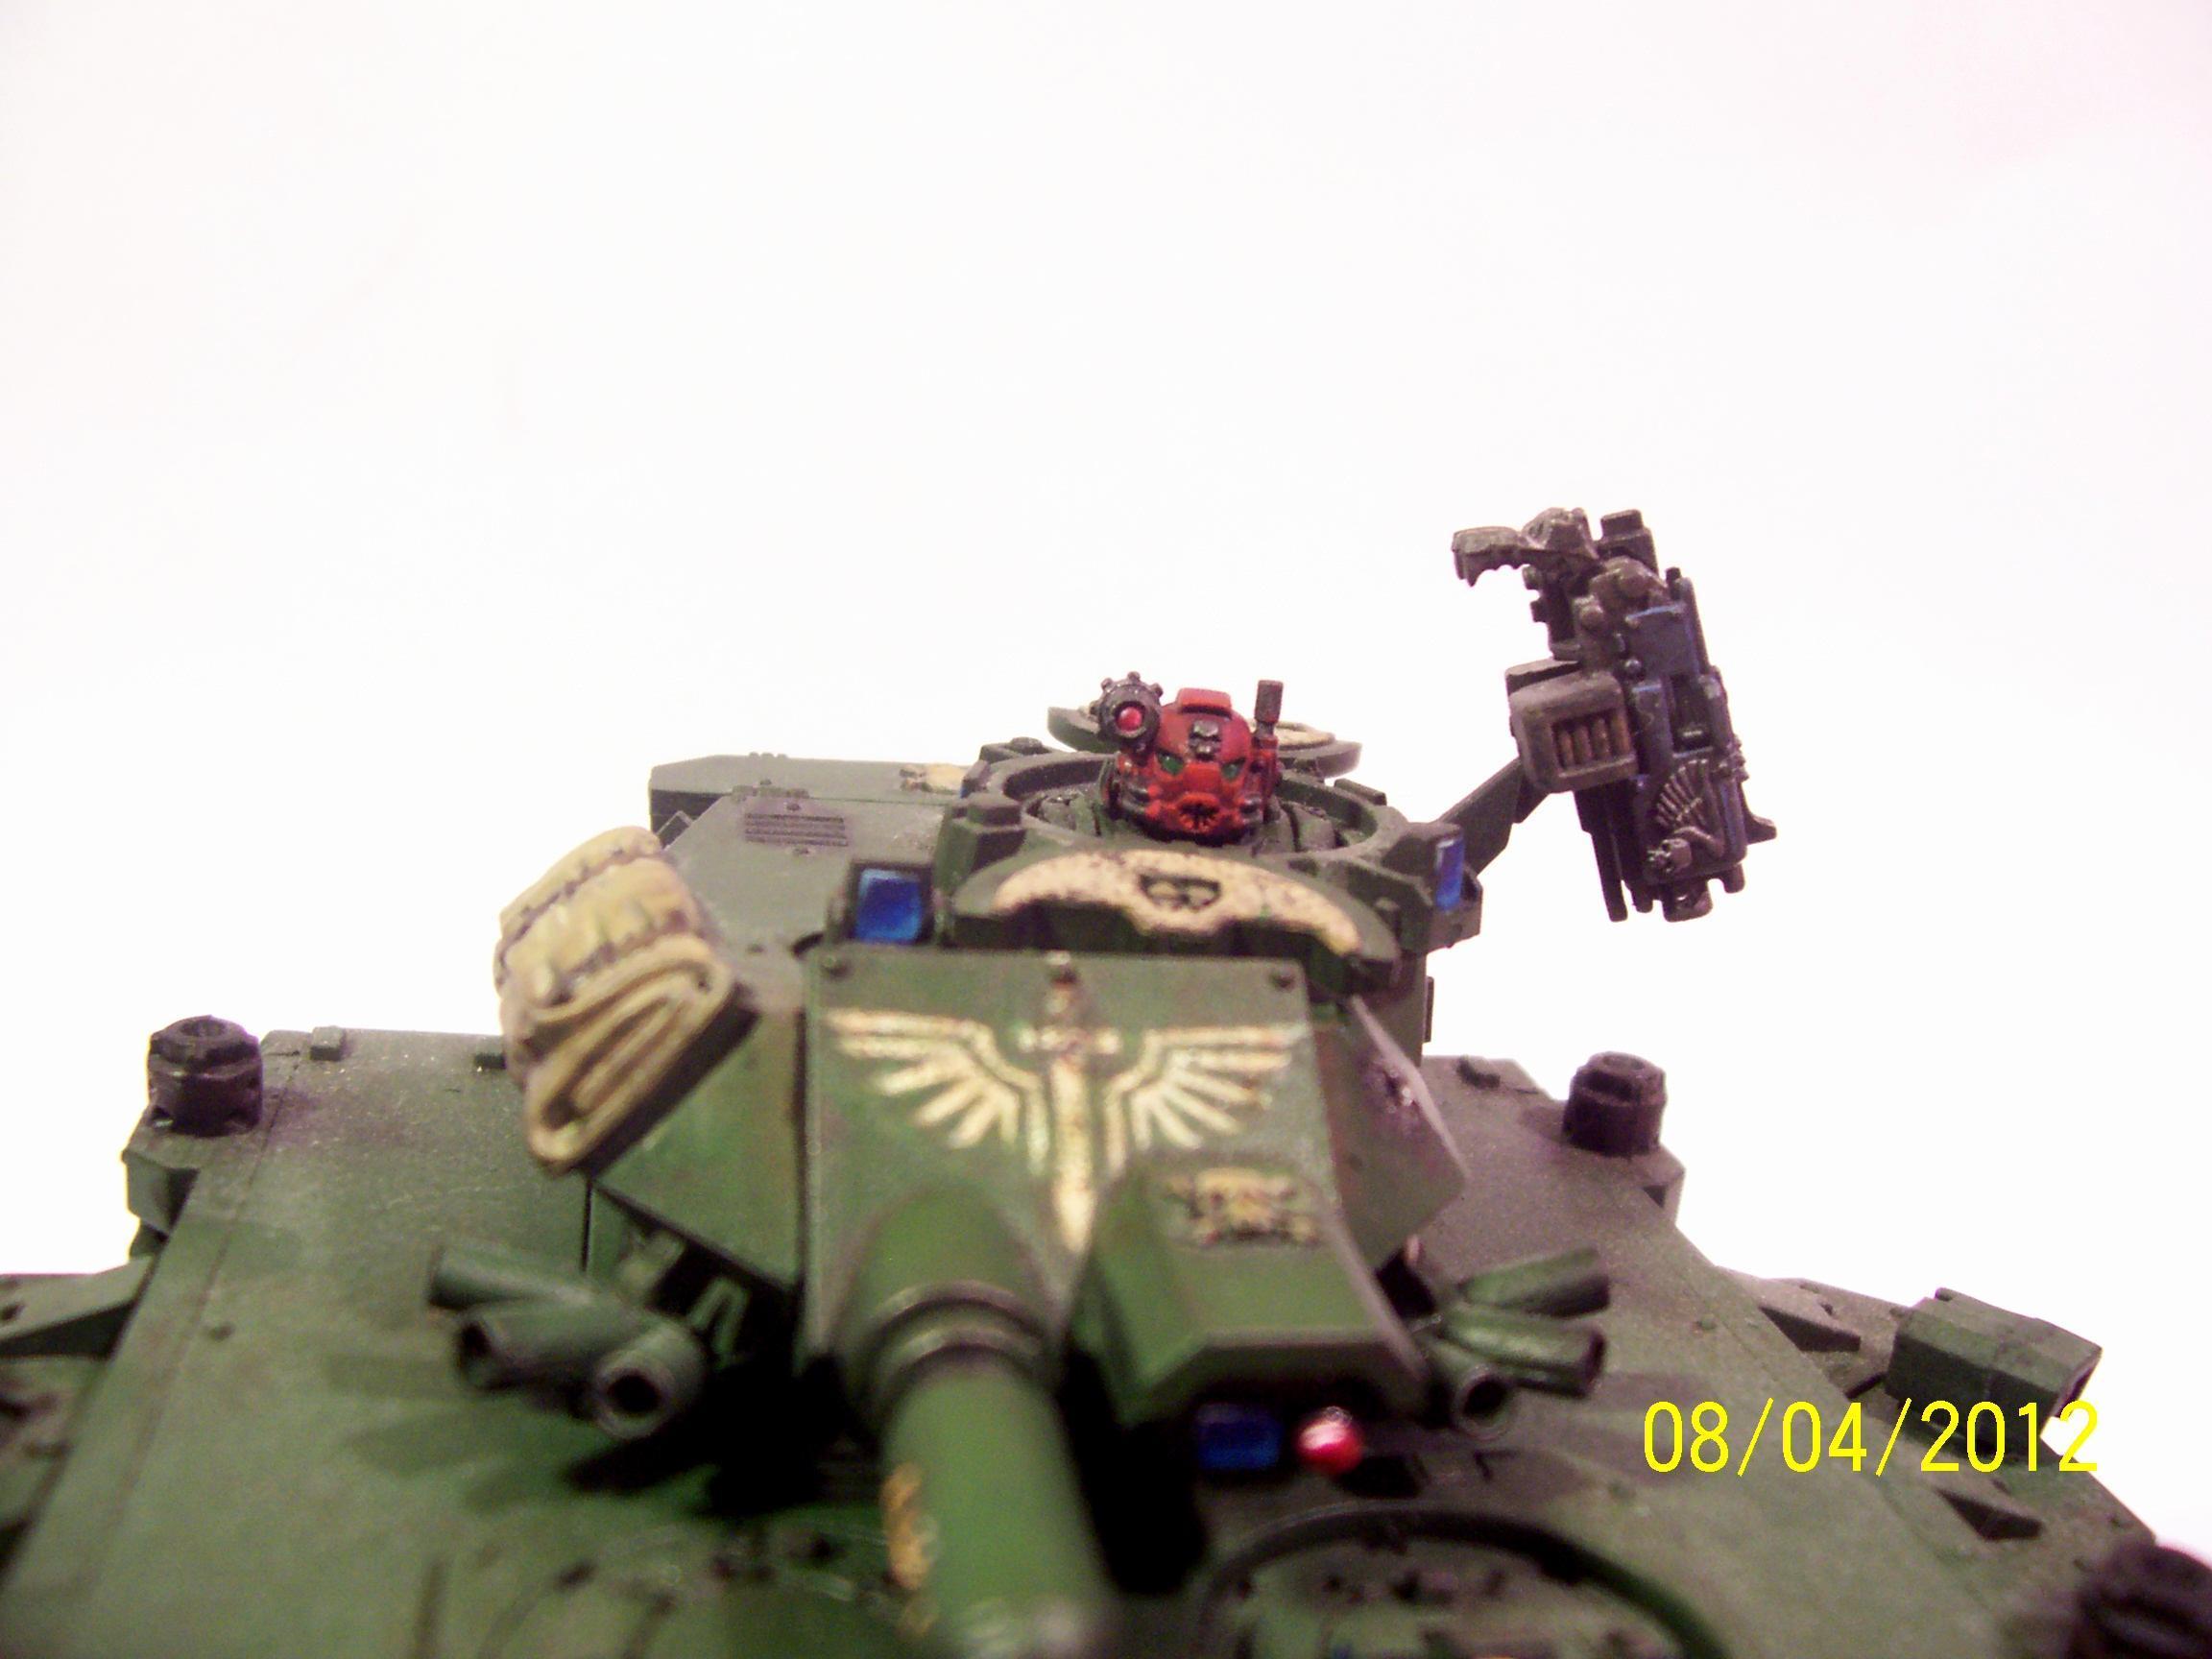 3rd Company, Dark Angels, Destructor, Predator, Tank